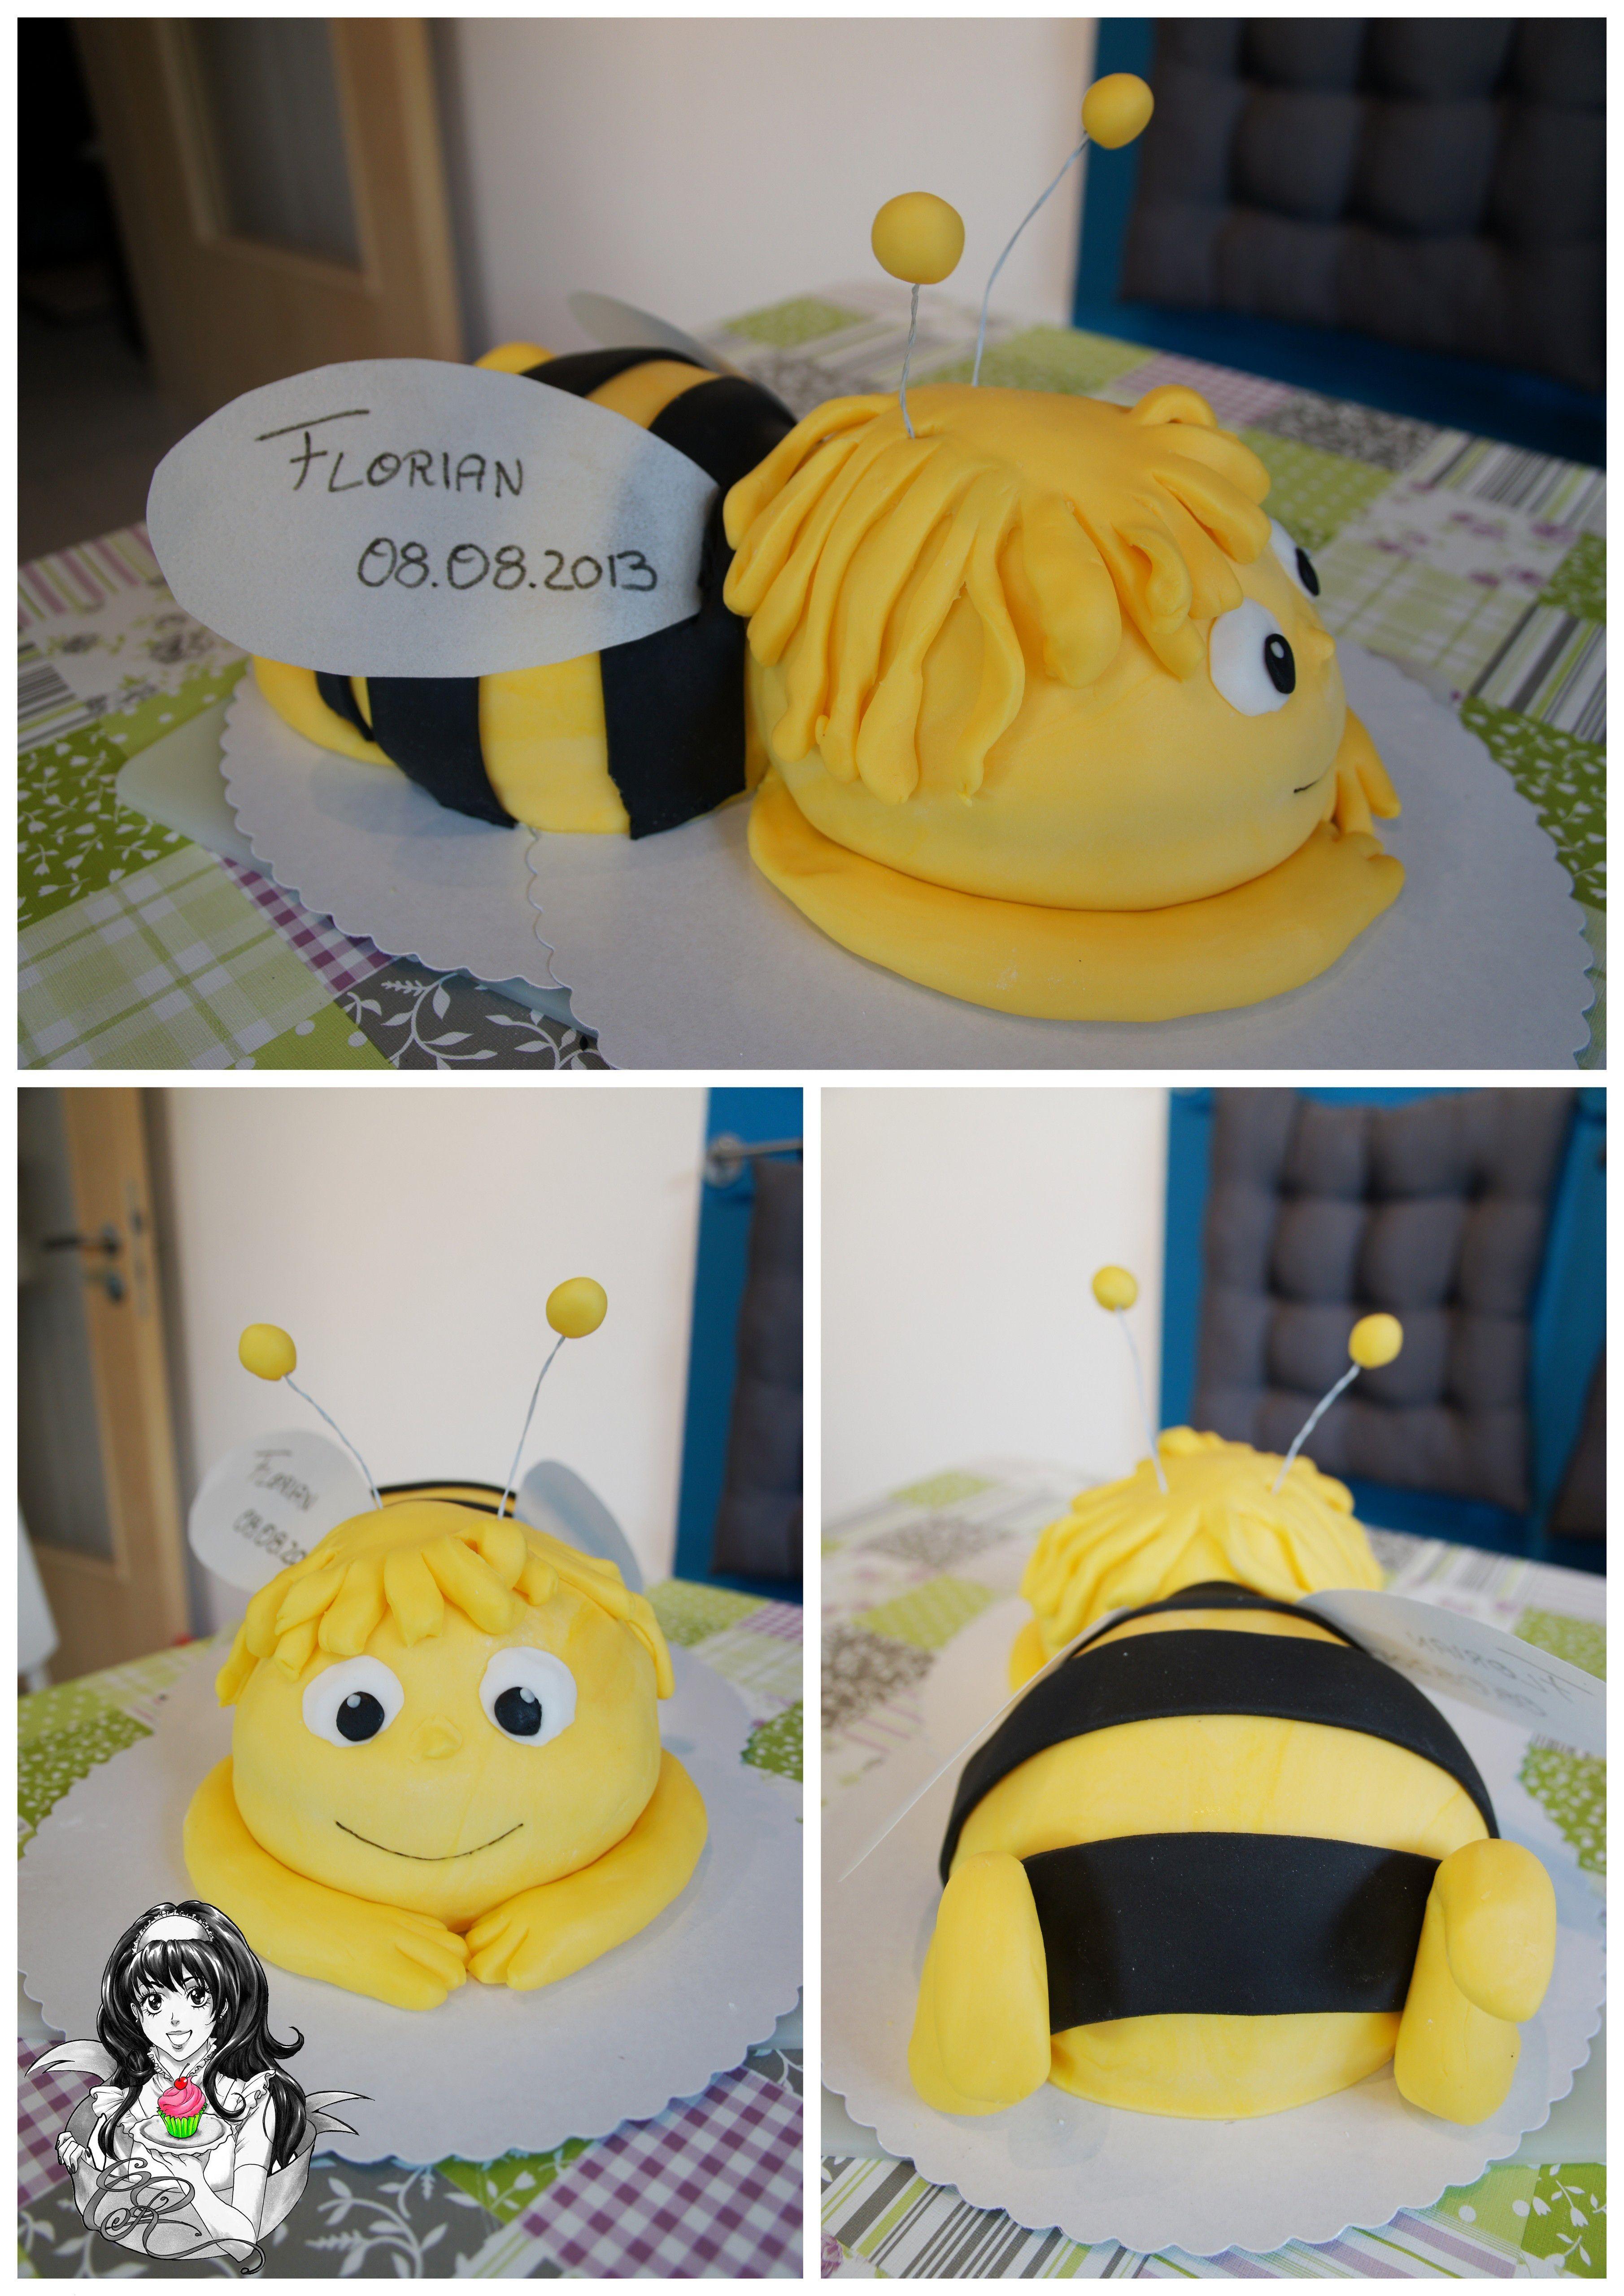 Biene Maja Torte Maya the Bee Cake https://www.facebook.com ...